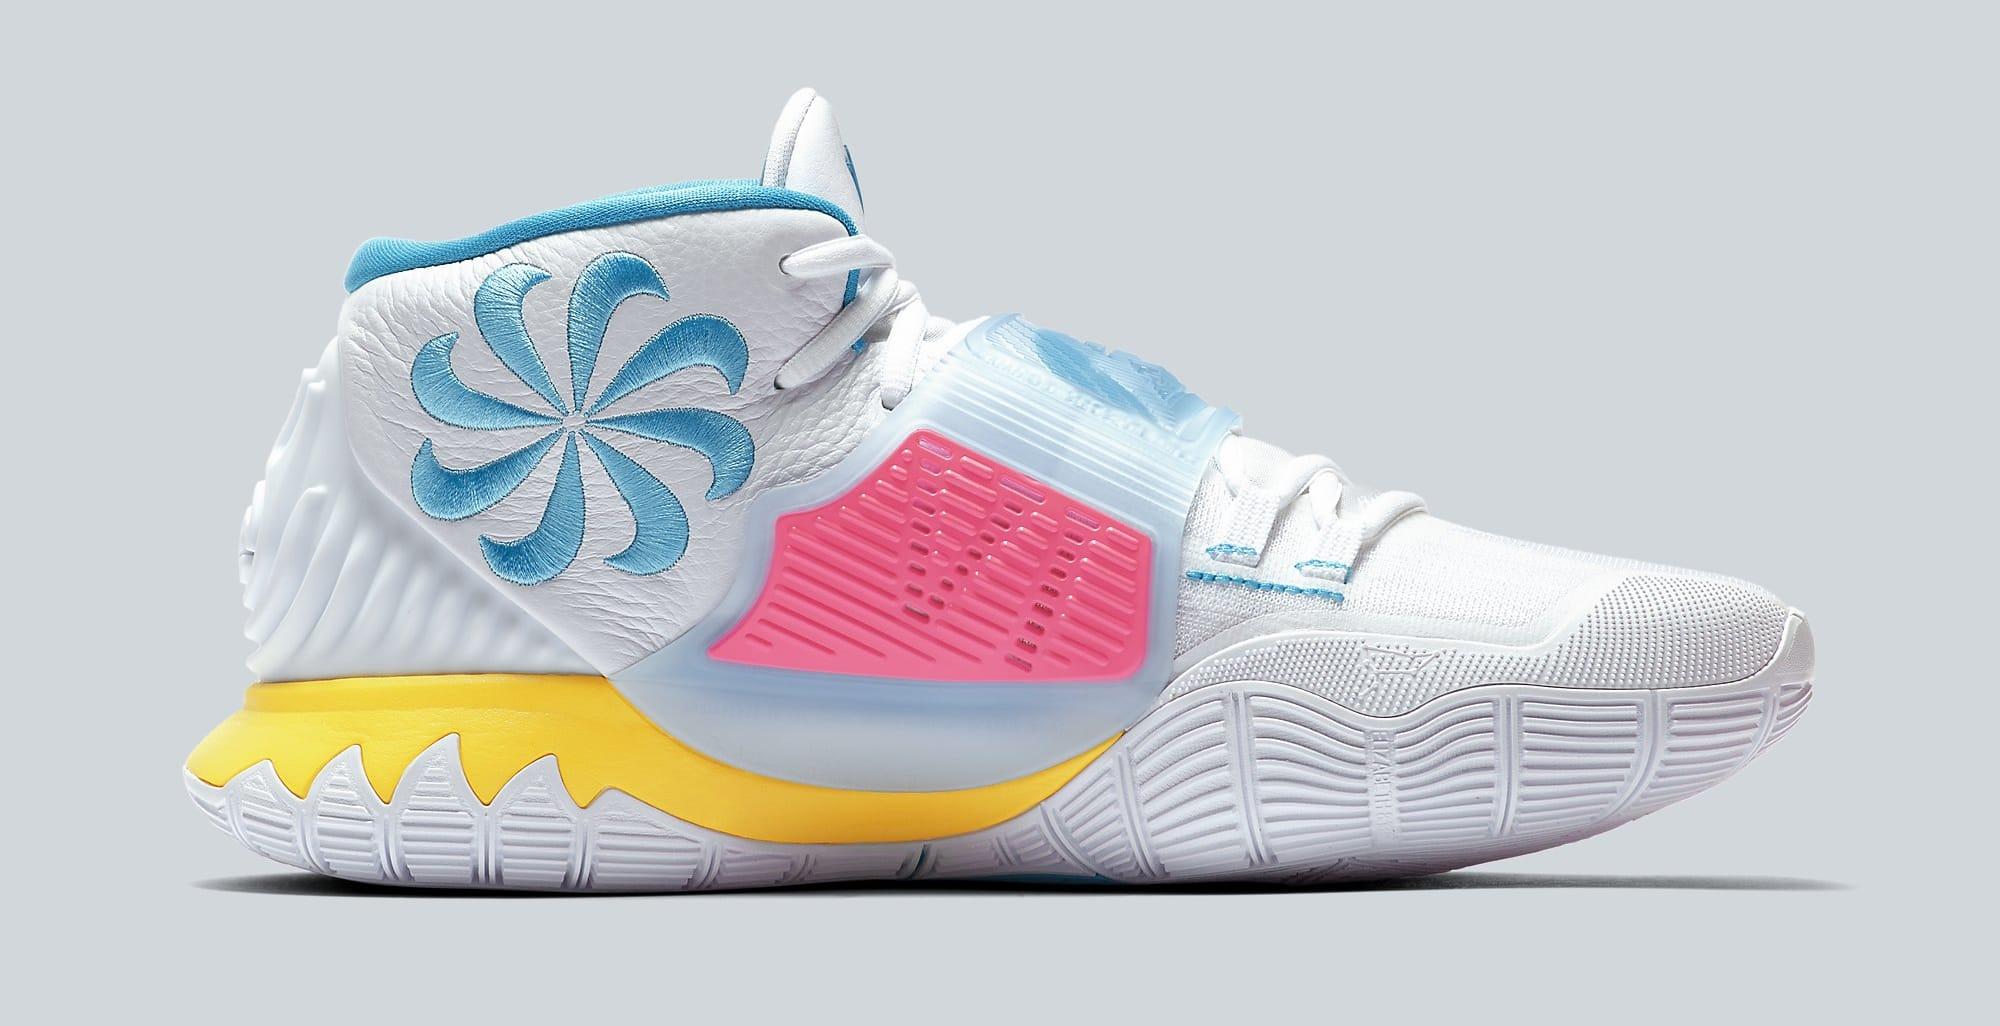 Nike Kyrie 6 'Neon Graffiti' BQ4630-101 Medial